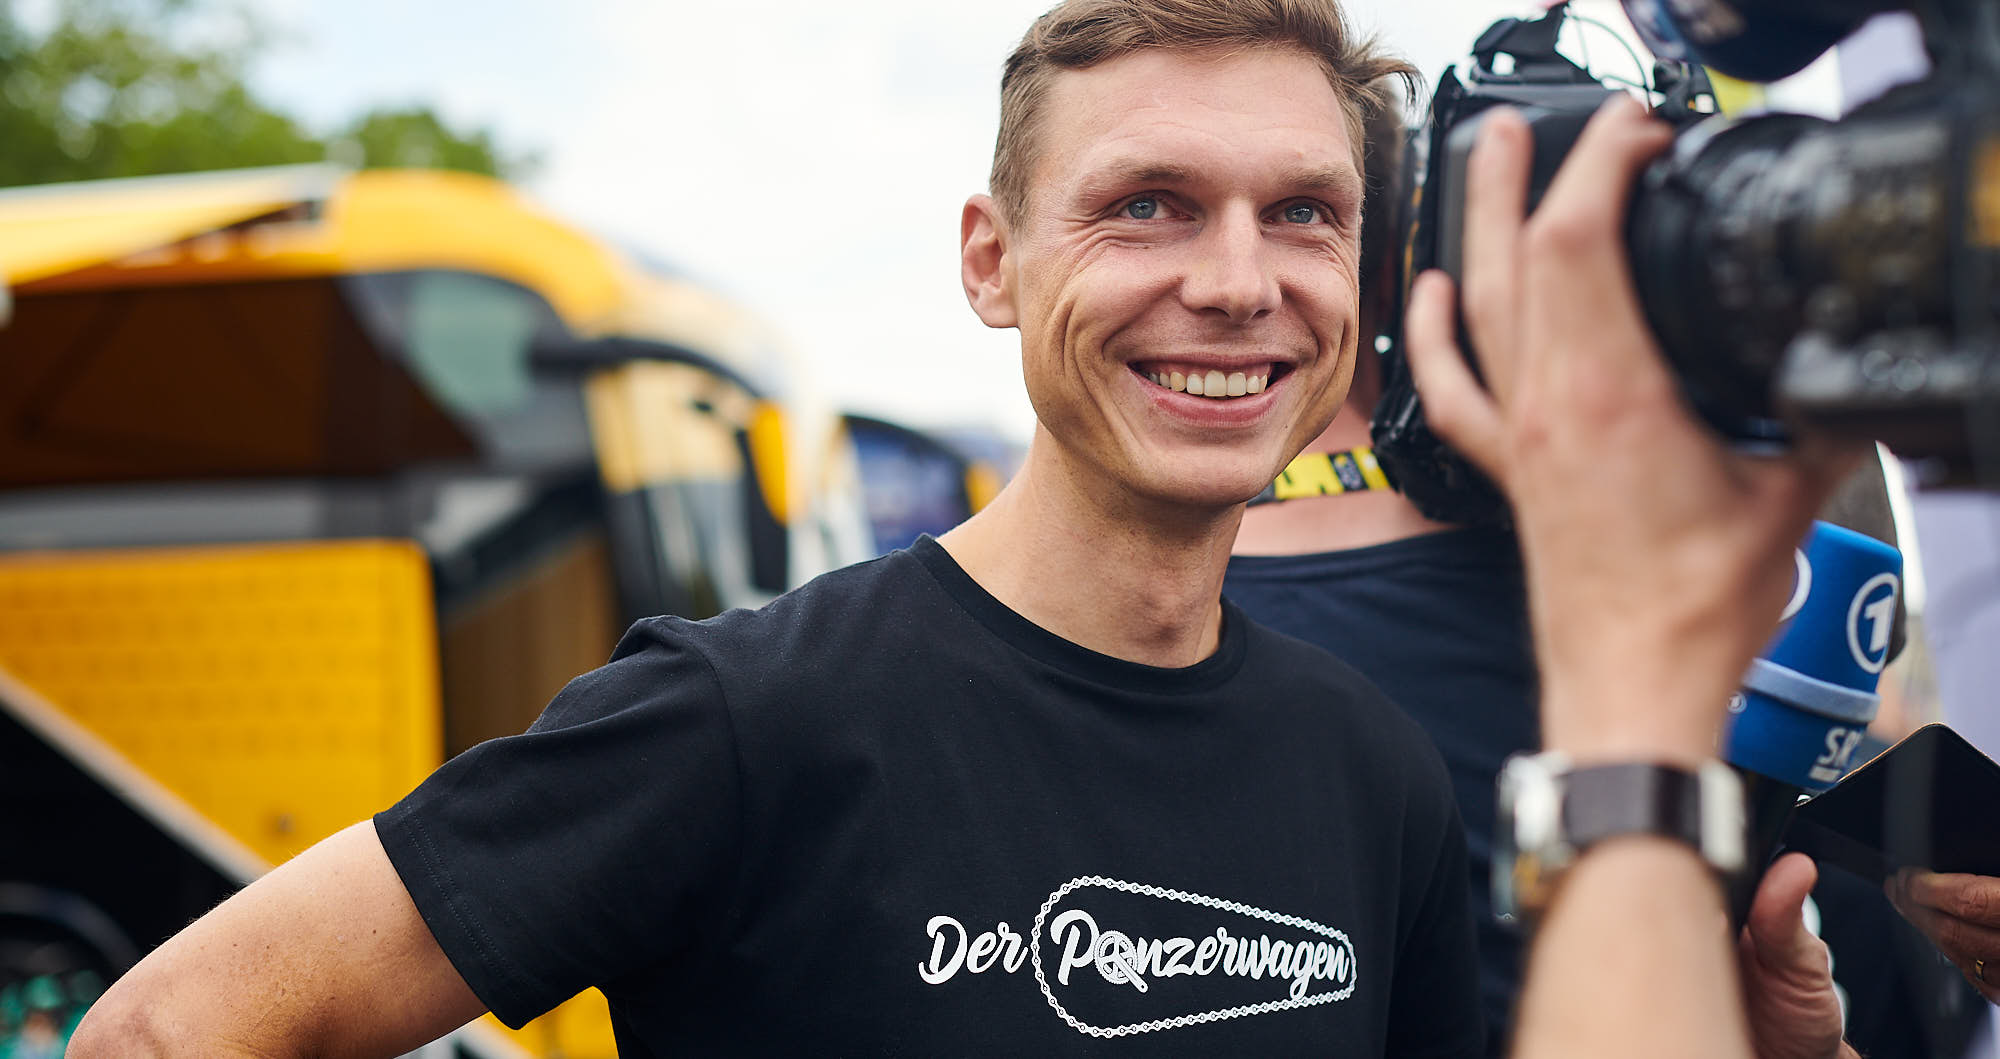 Tony Martin wearing a Panzerwagen shirt at the 2019 Tour de France